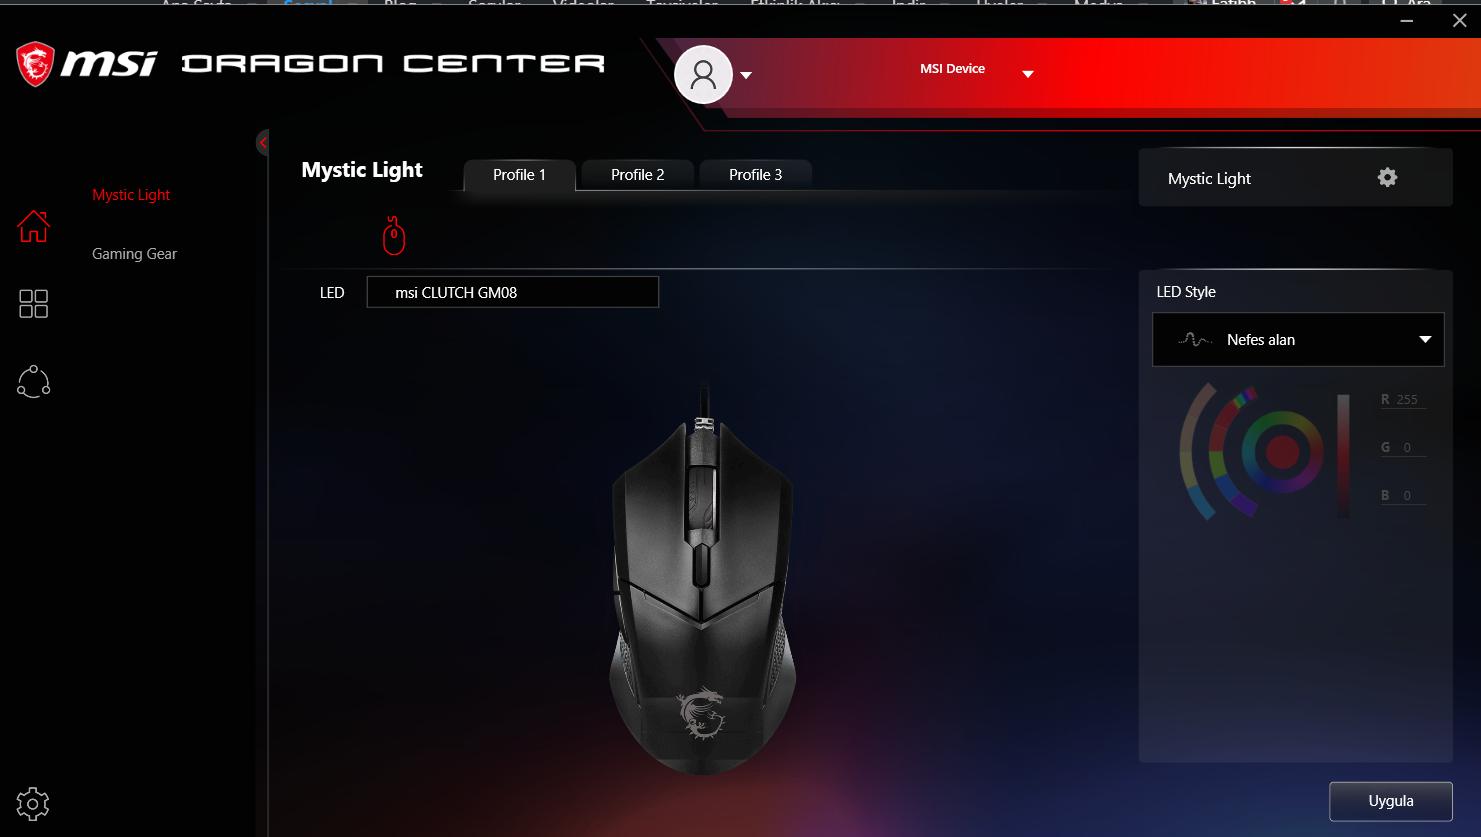 Desktop Screenshot 2021.02.16 - 17.40.05.21 (2).png